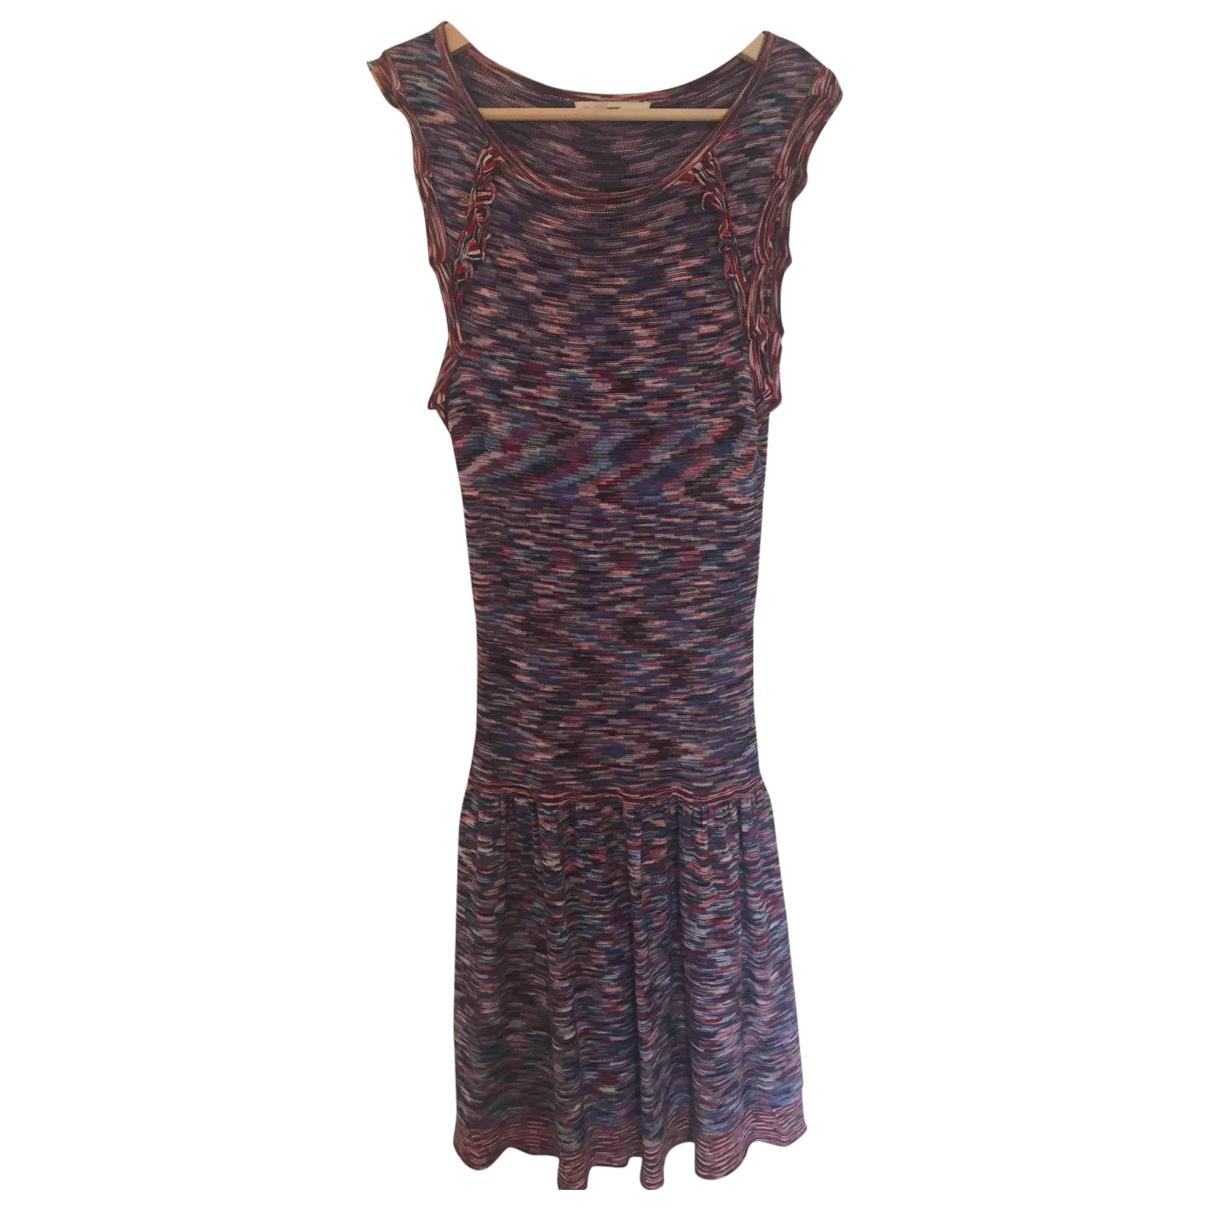 Maje \N Multicolour Cotton - elasthane dress for Women 1 0-5